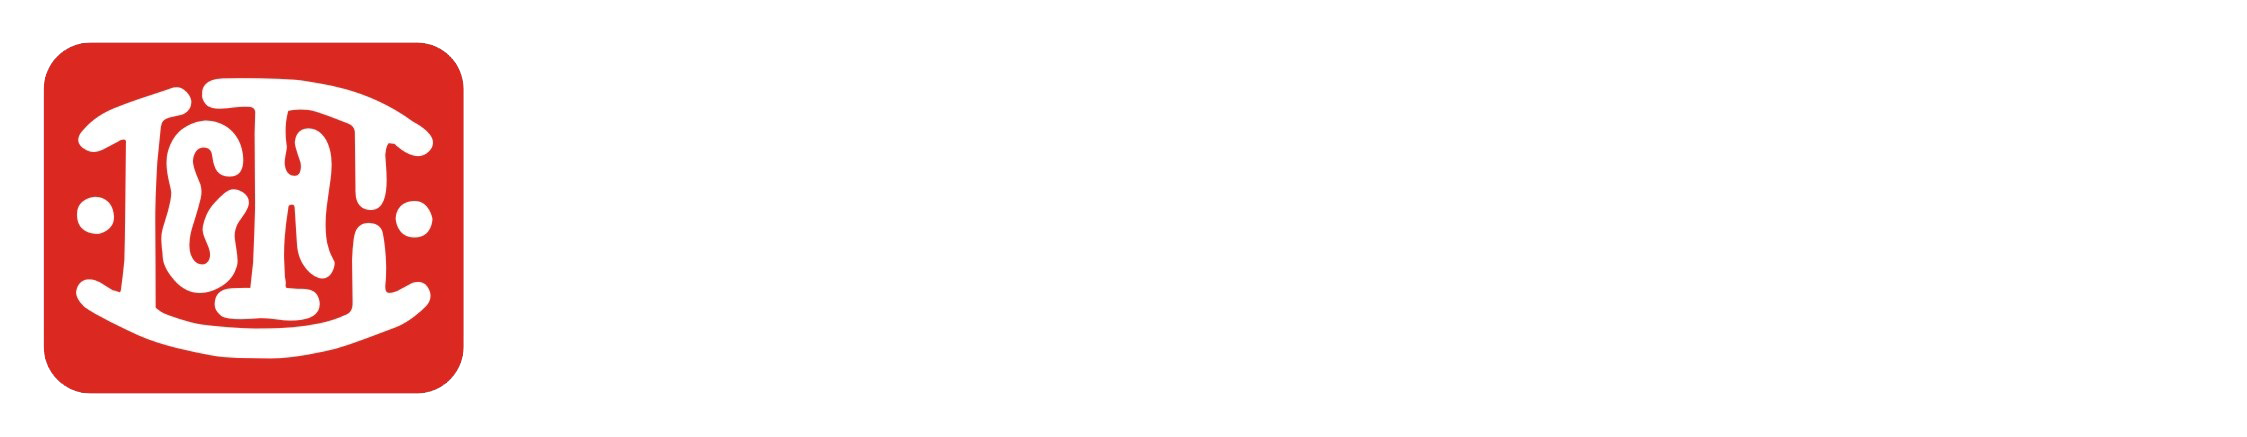 Li_and_Fung_logo.png